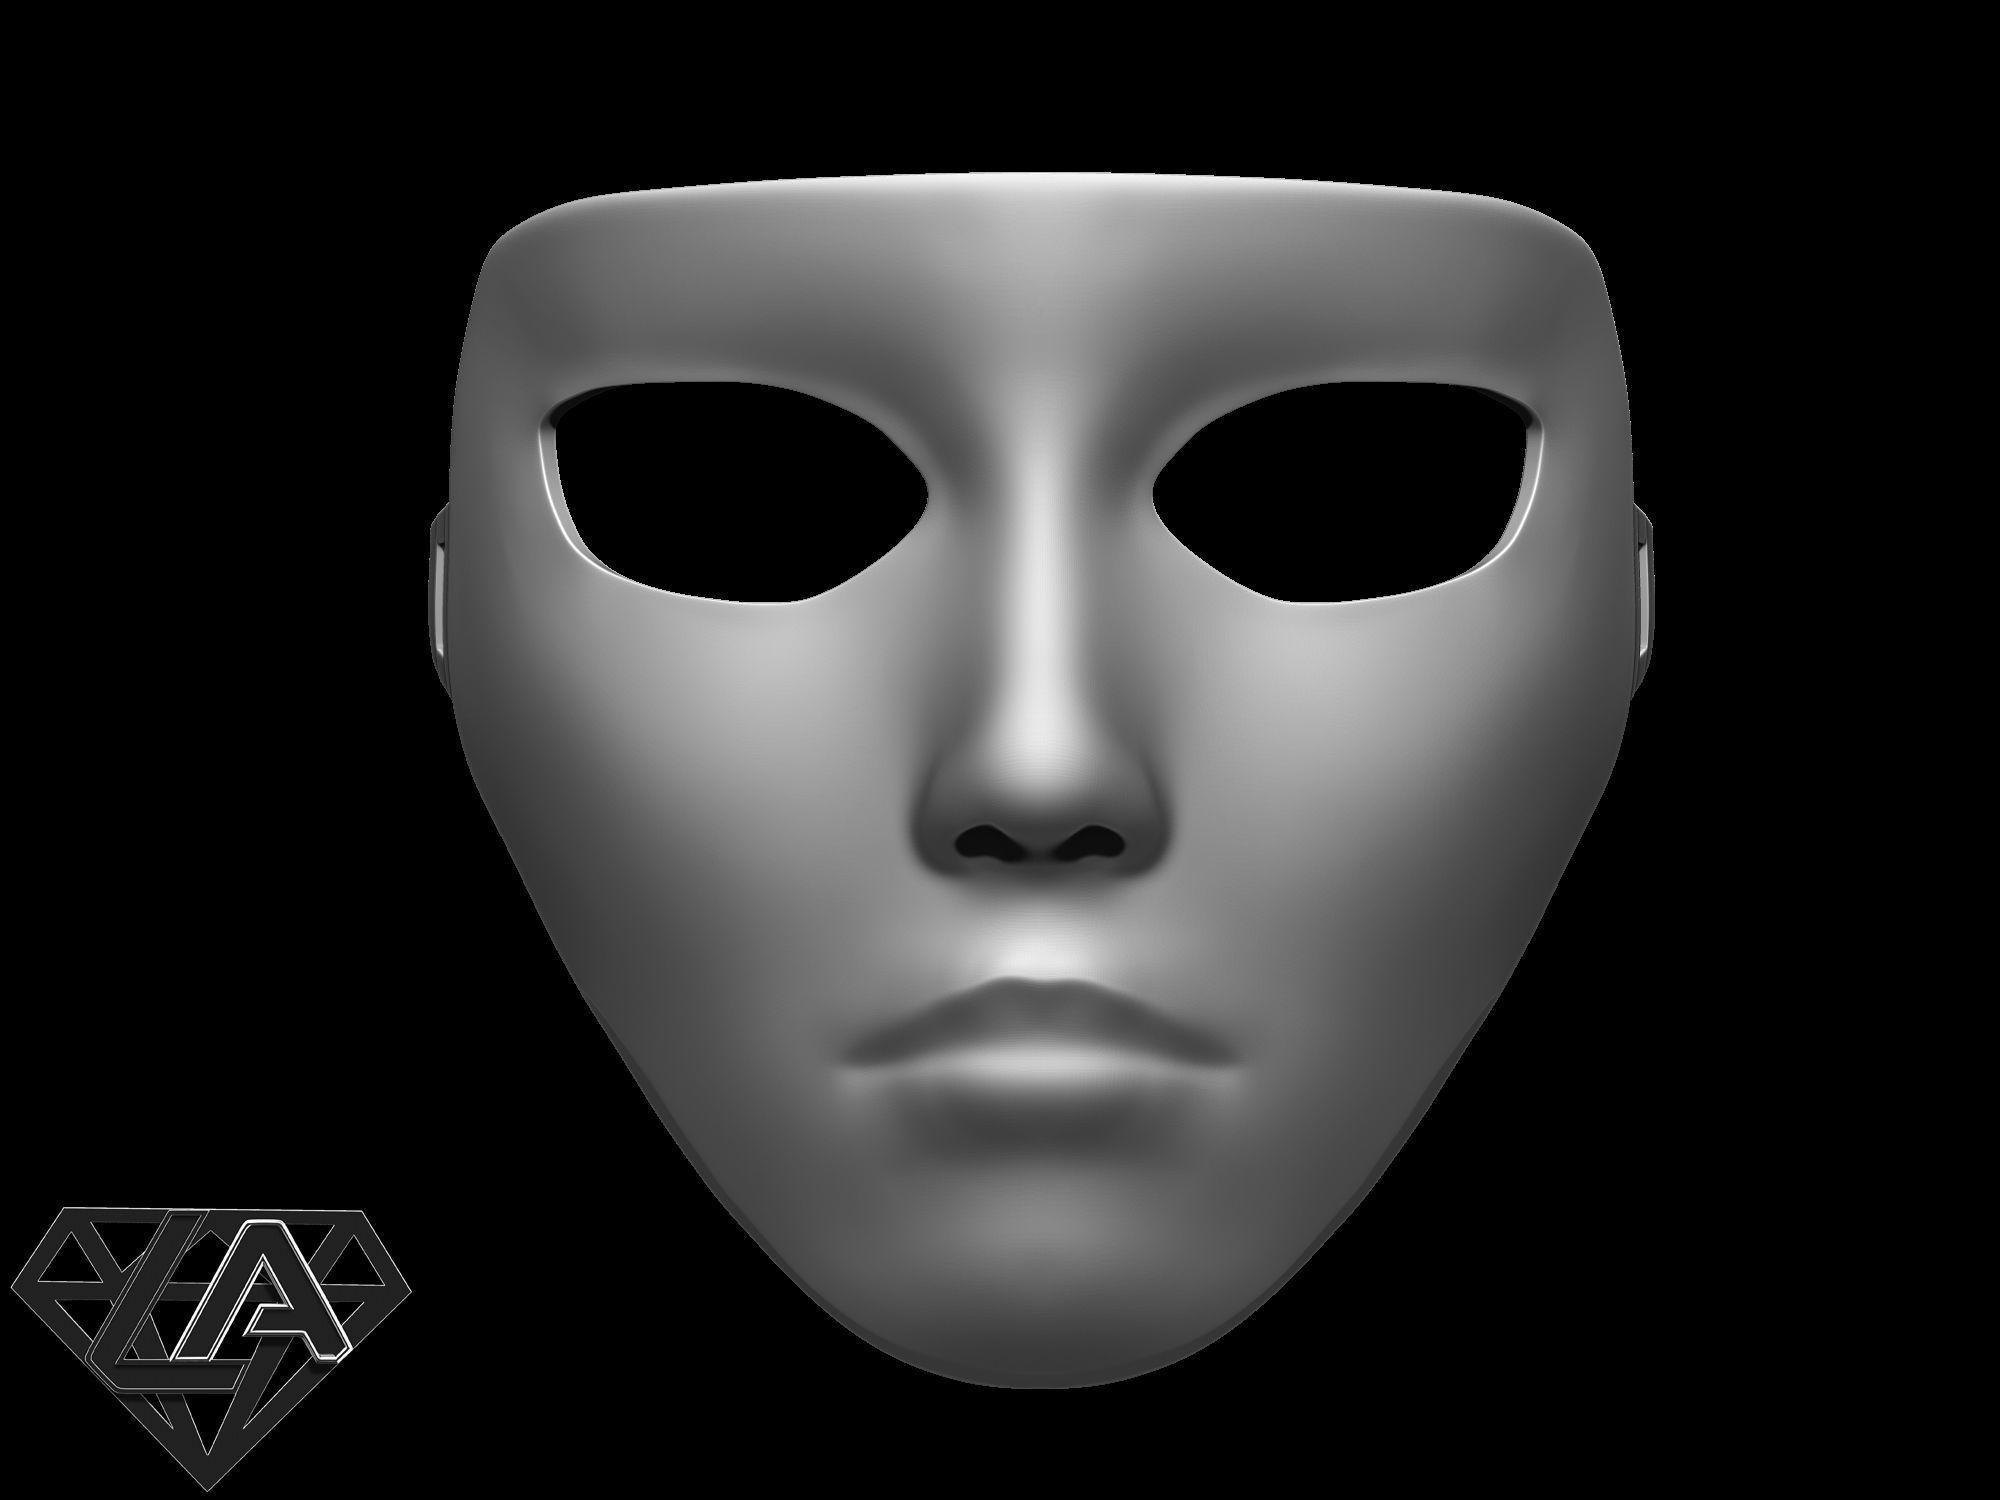 COD MW 2019 Roze Murk Mask